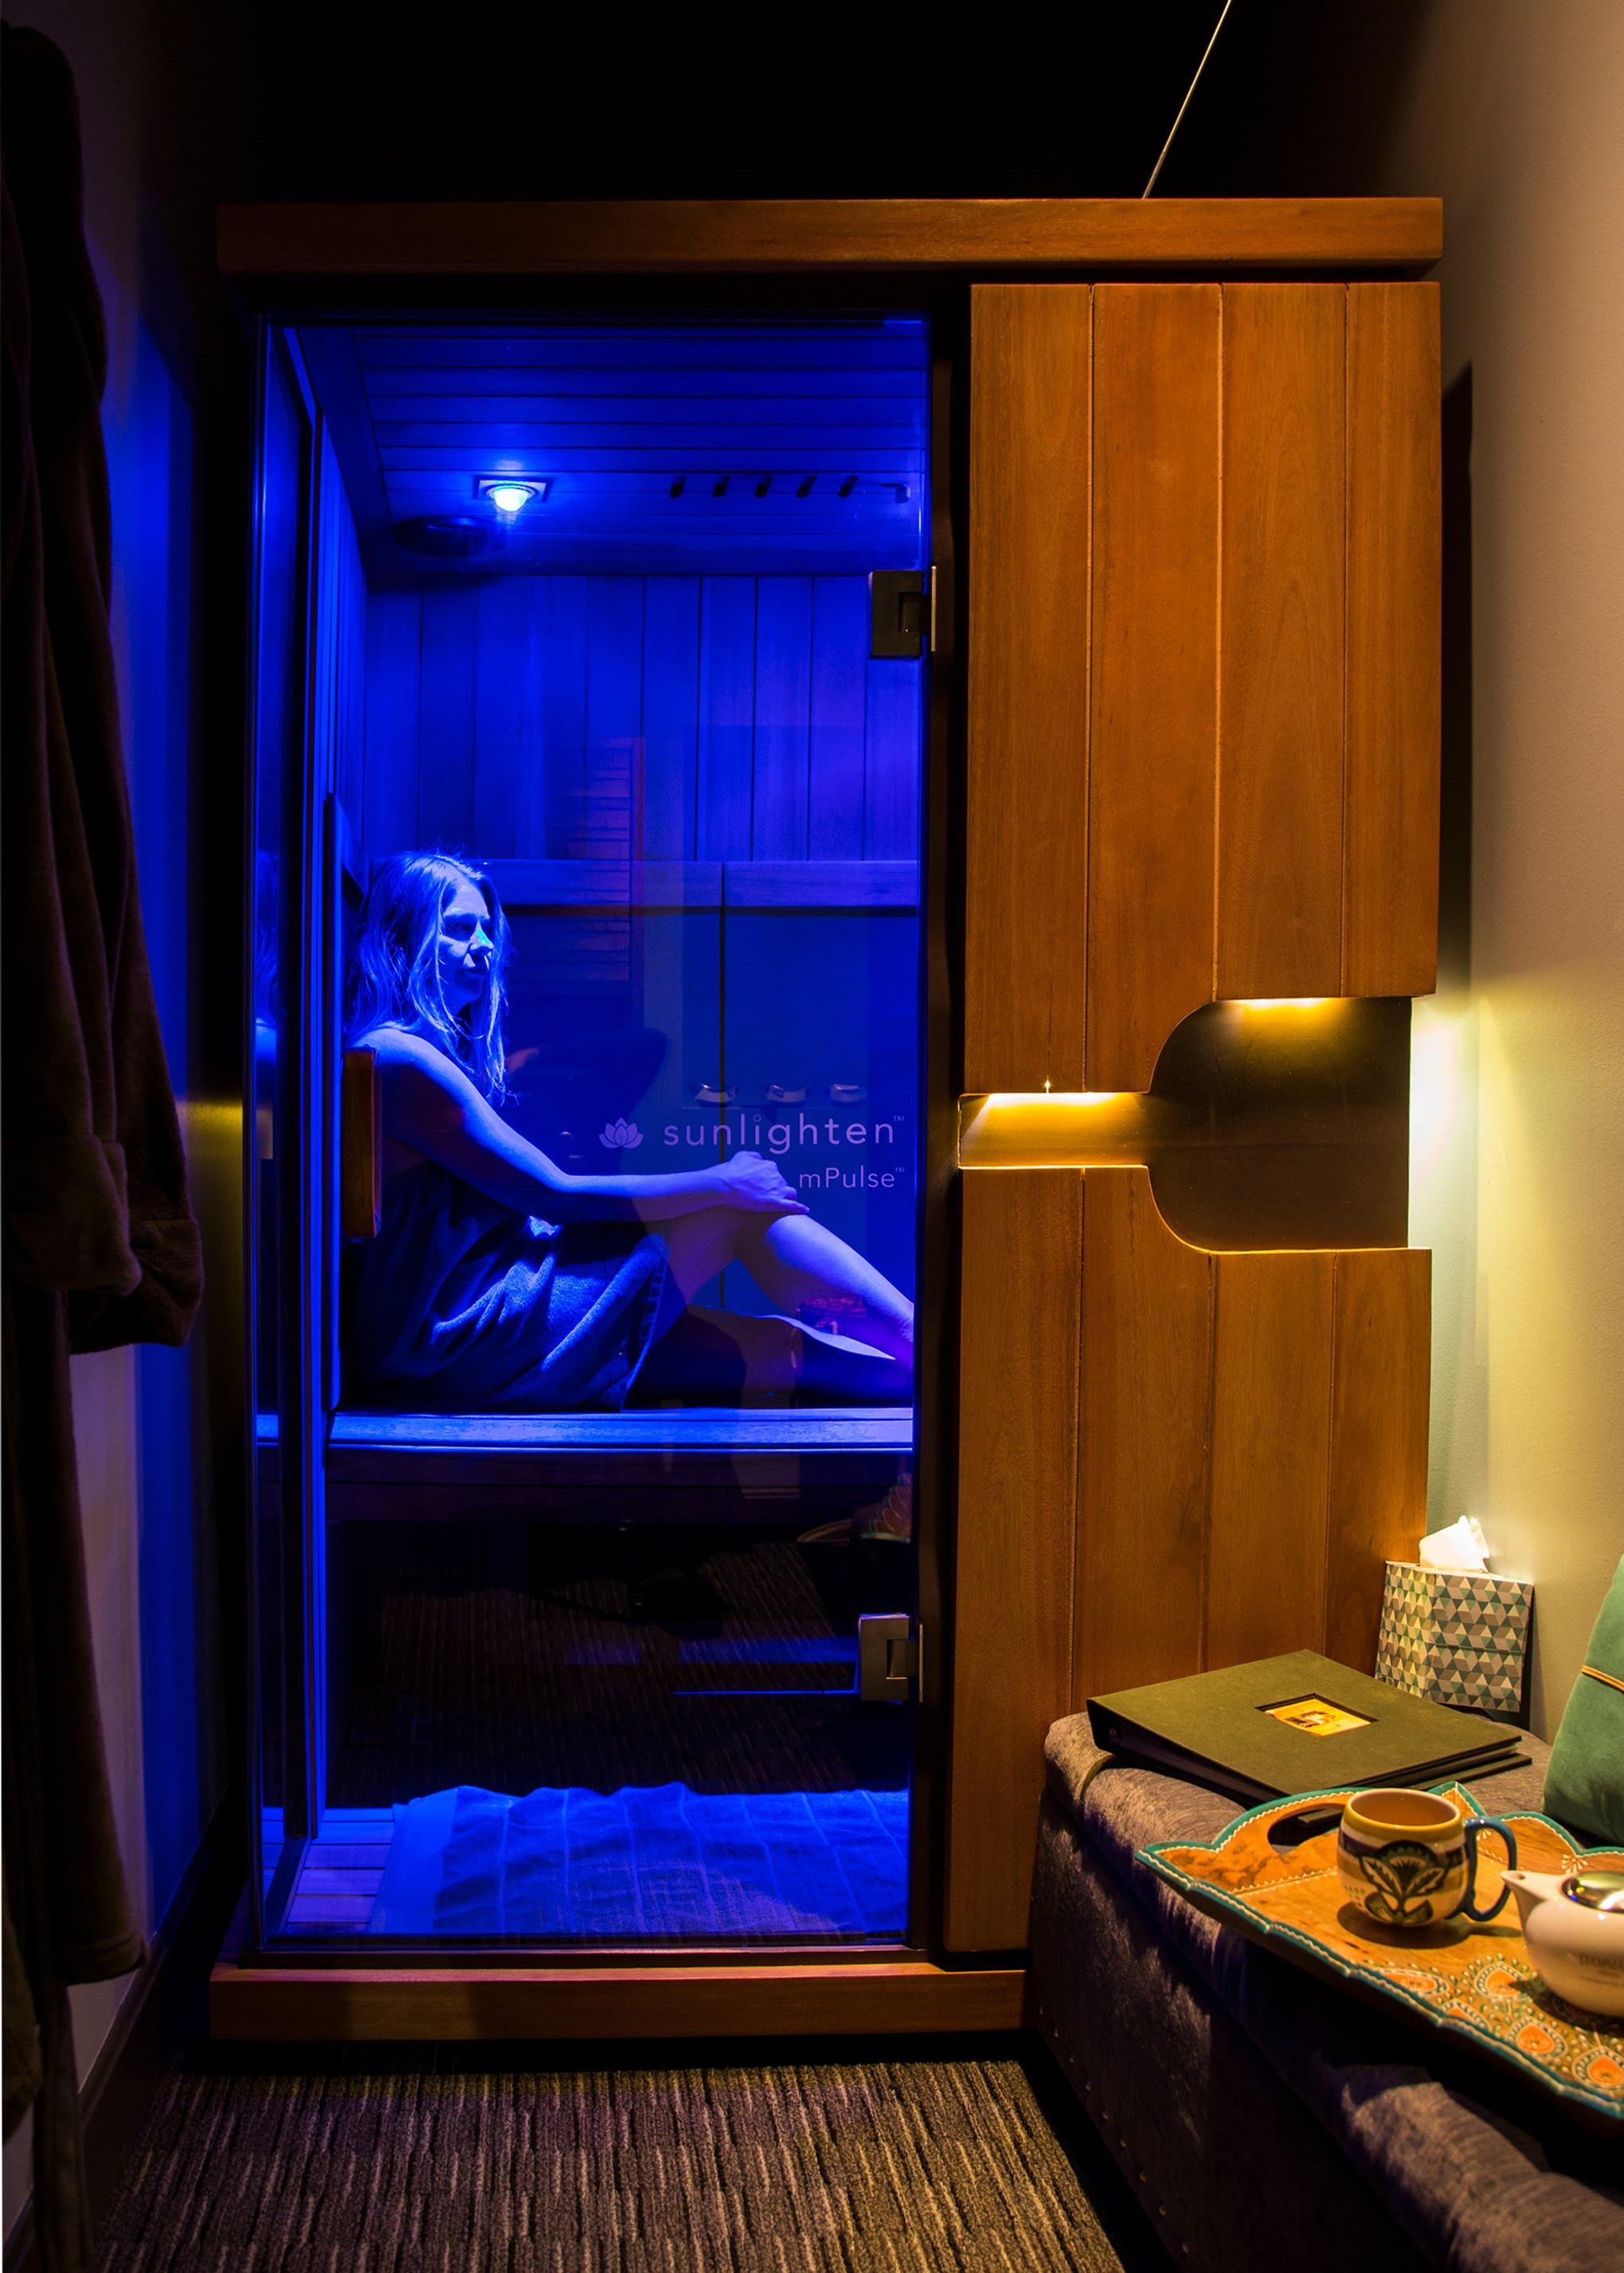 40 min. Infrared Sauna Session + Tea